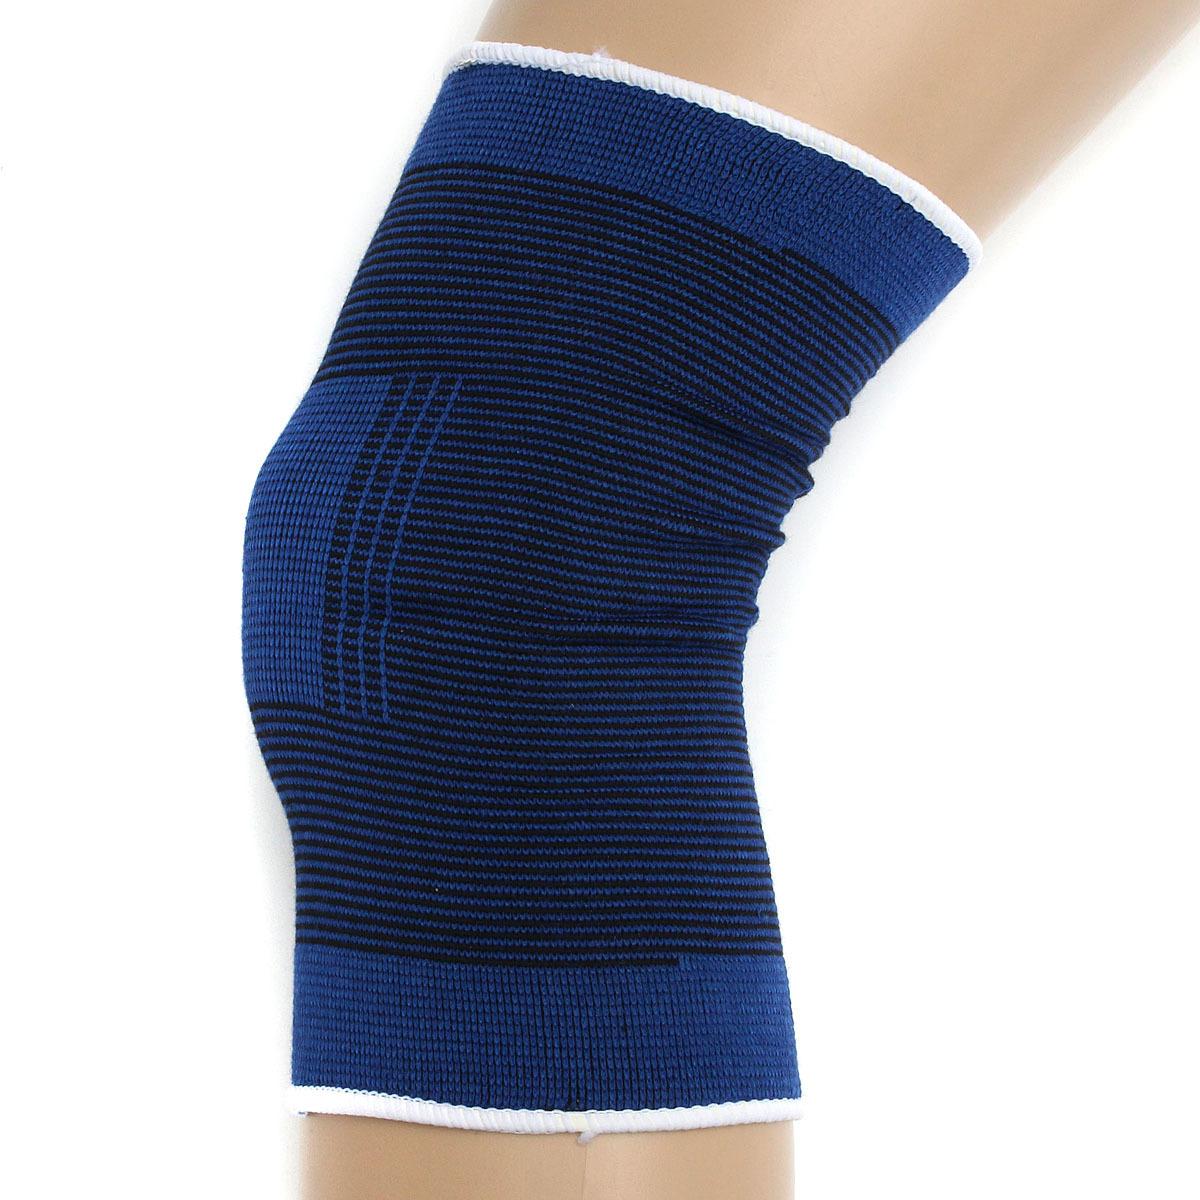 Baru 2 Buah Penyangga Lutut Kaki Lutut Cedera Lengan Dukungan Penyangga Melindungi Olahraga Gym